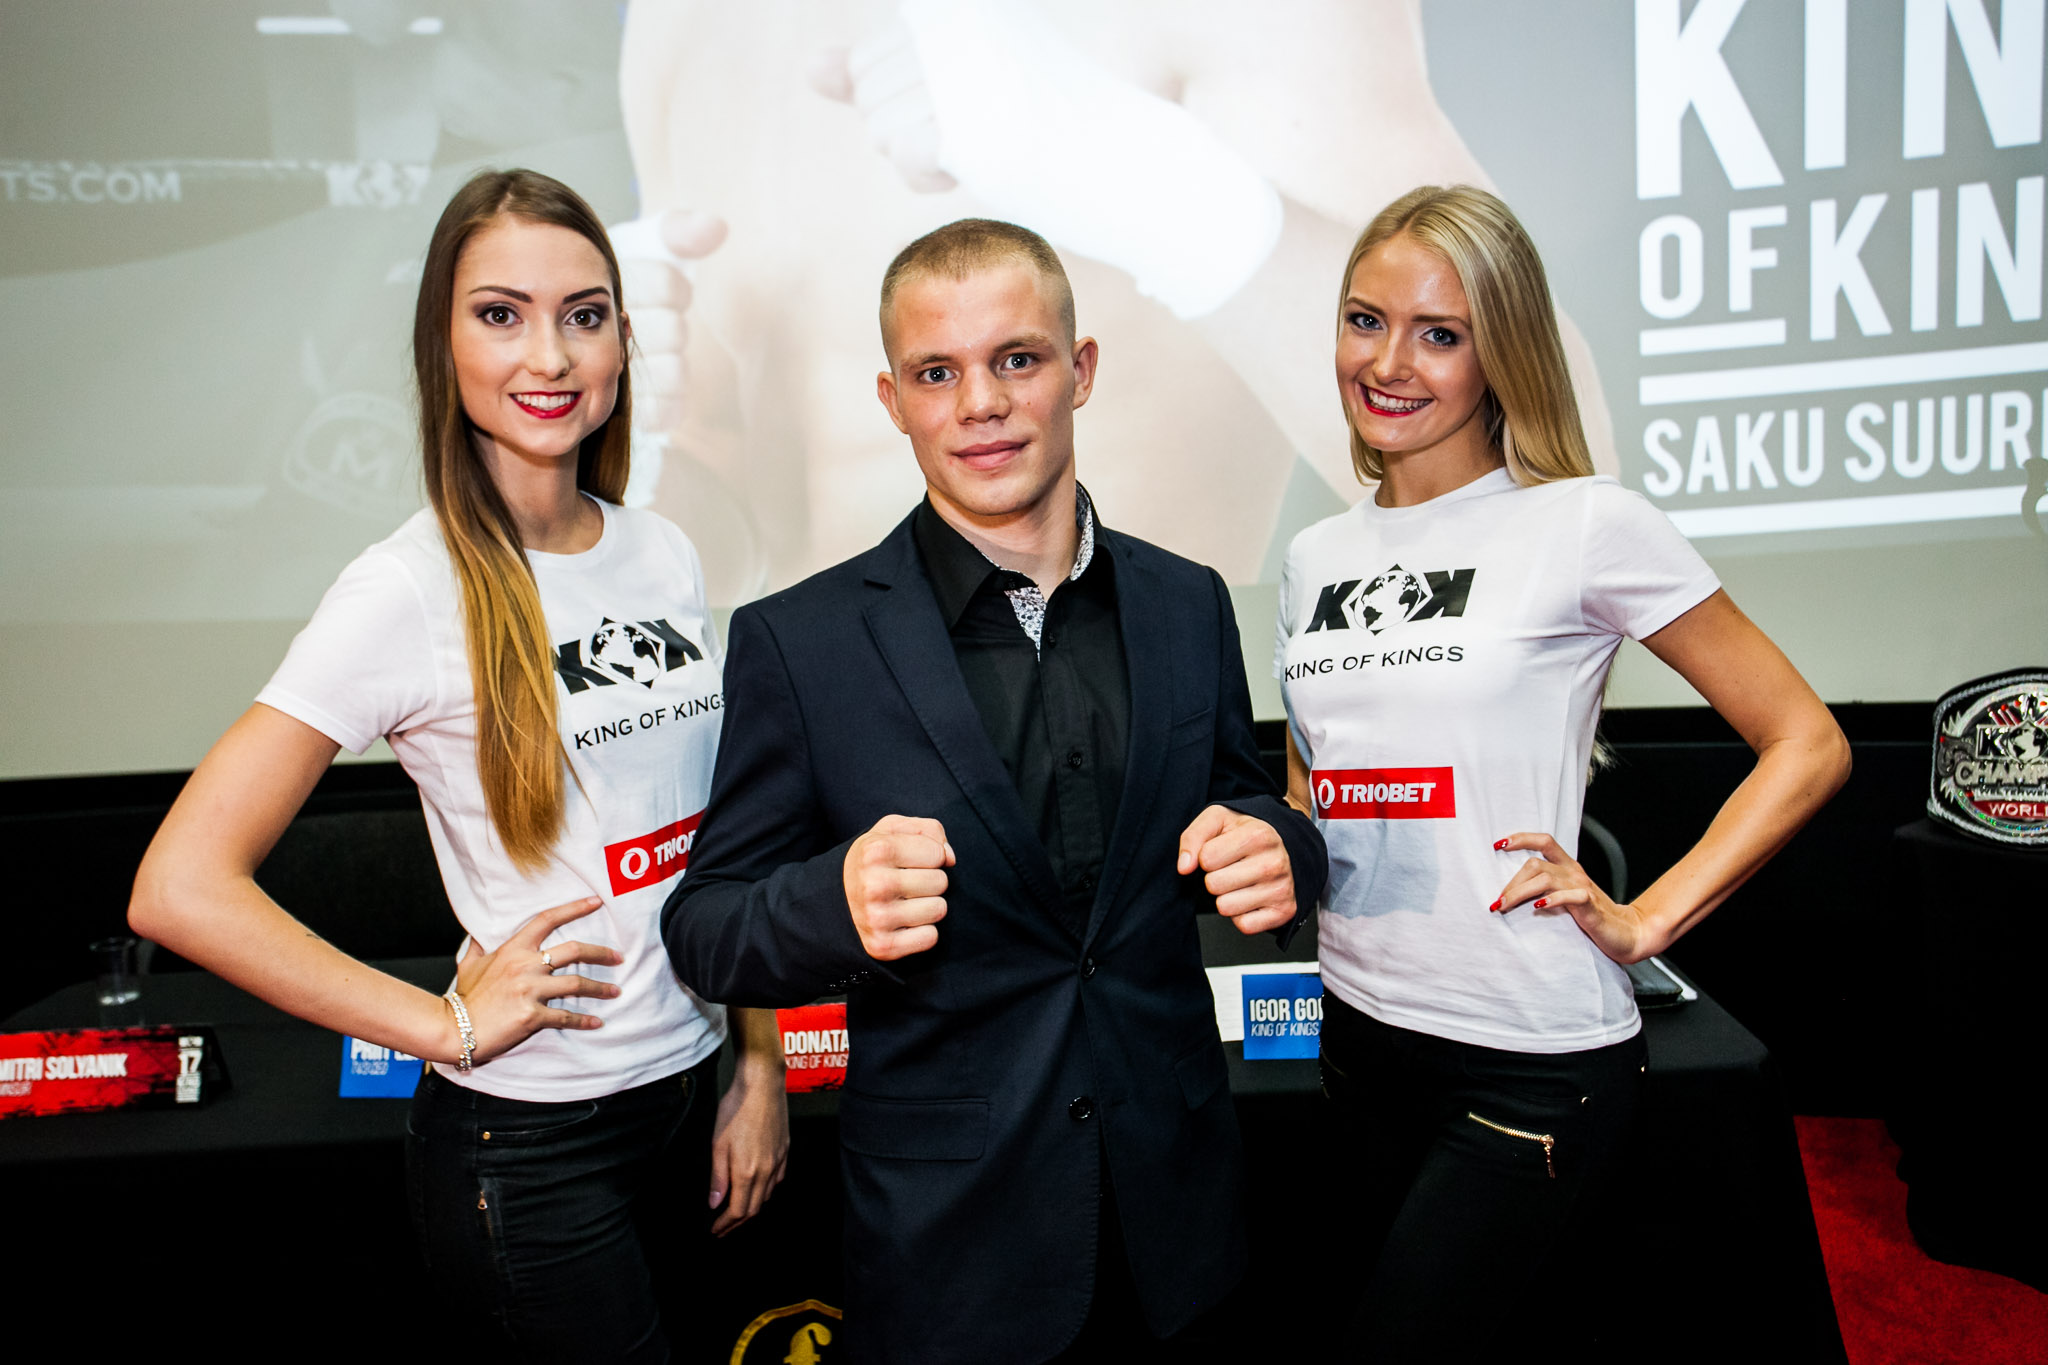 Markko Moisar